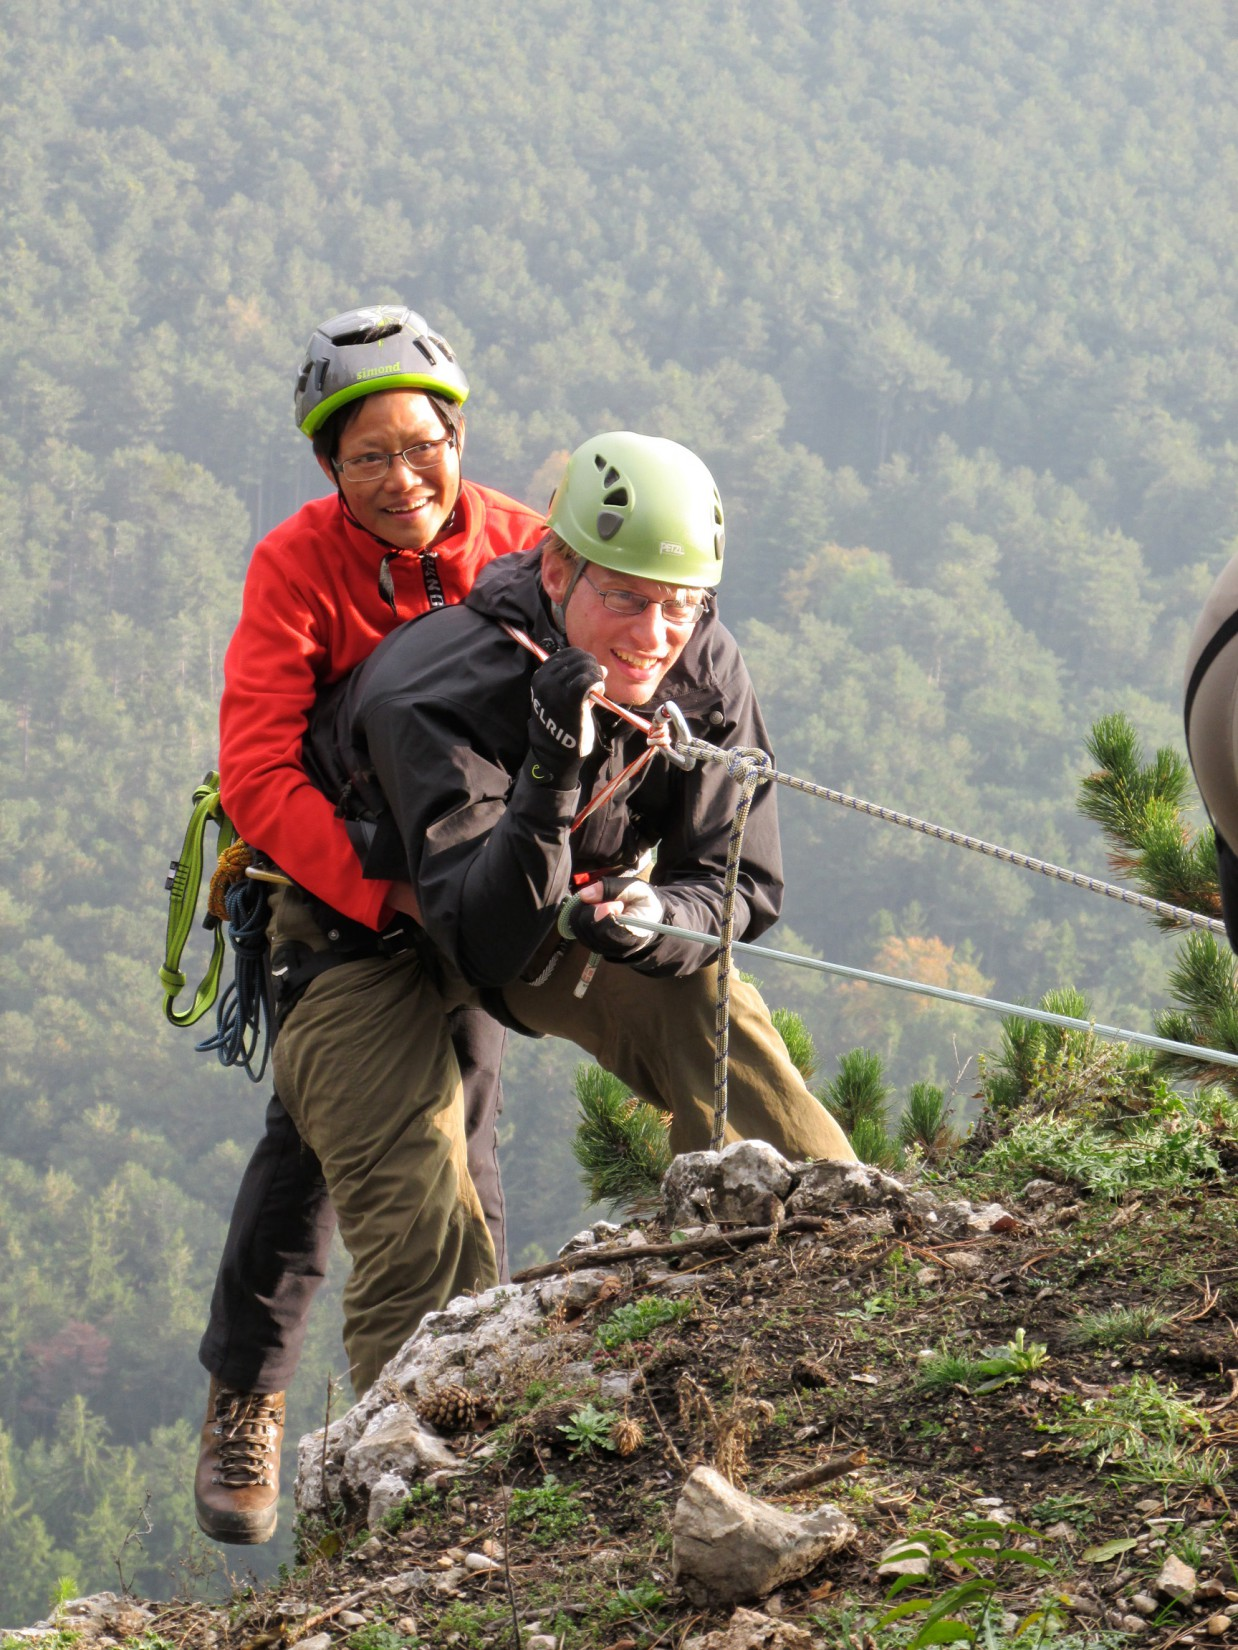 Notfallmanagement - Erste Hilfe Alpin